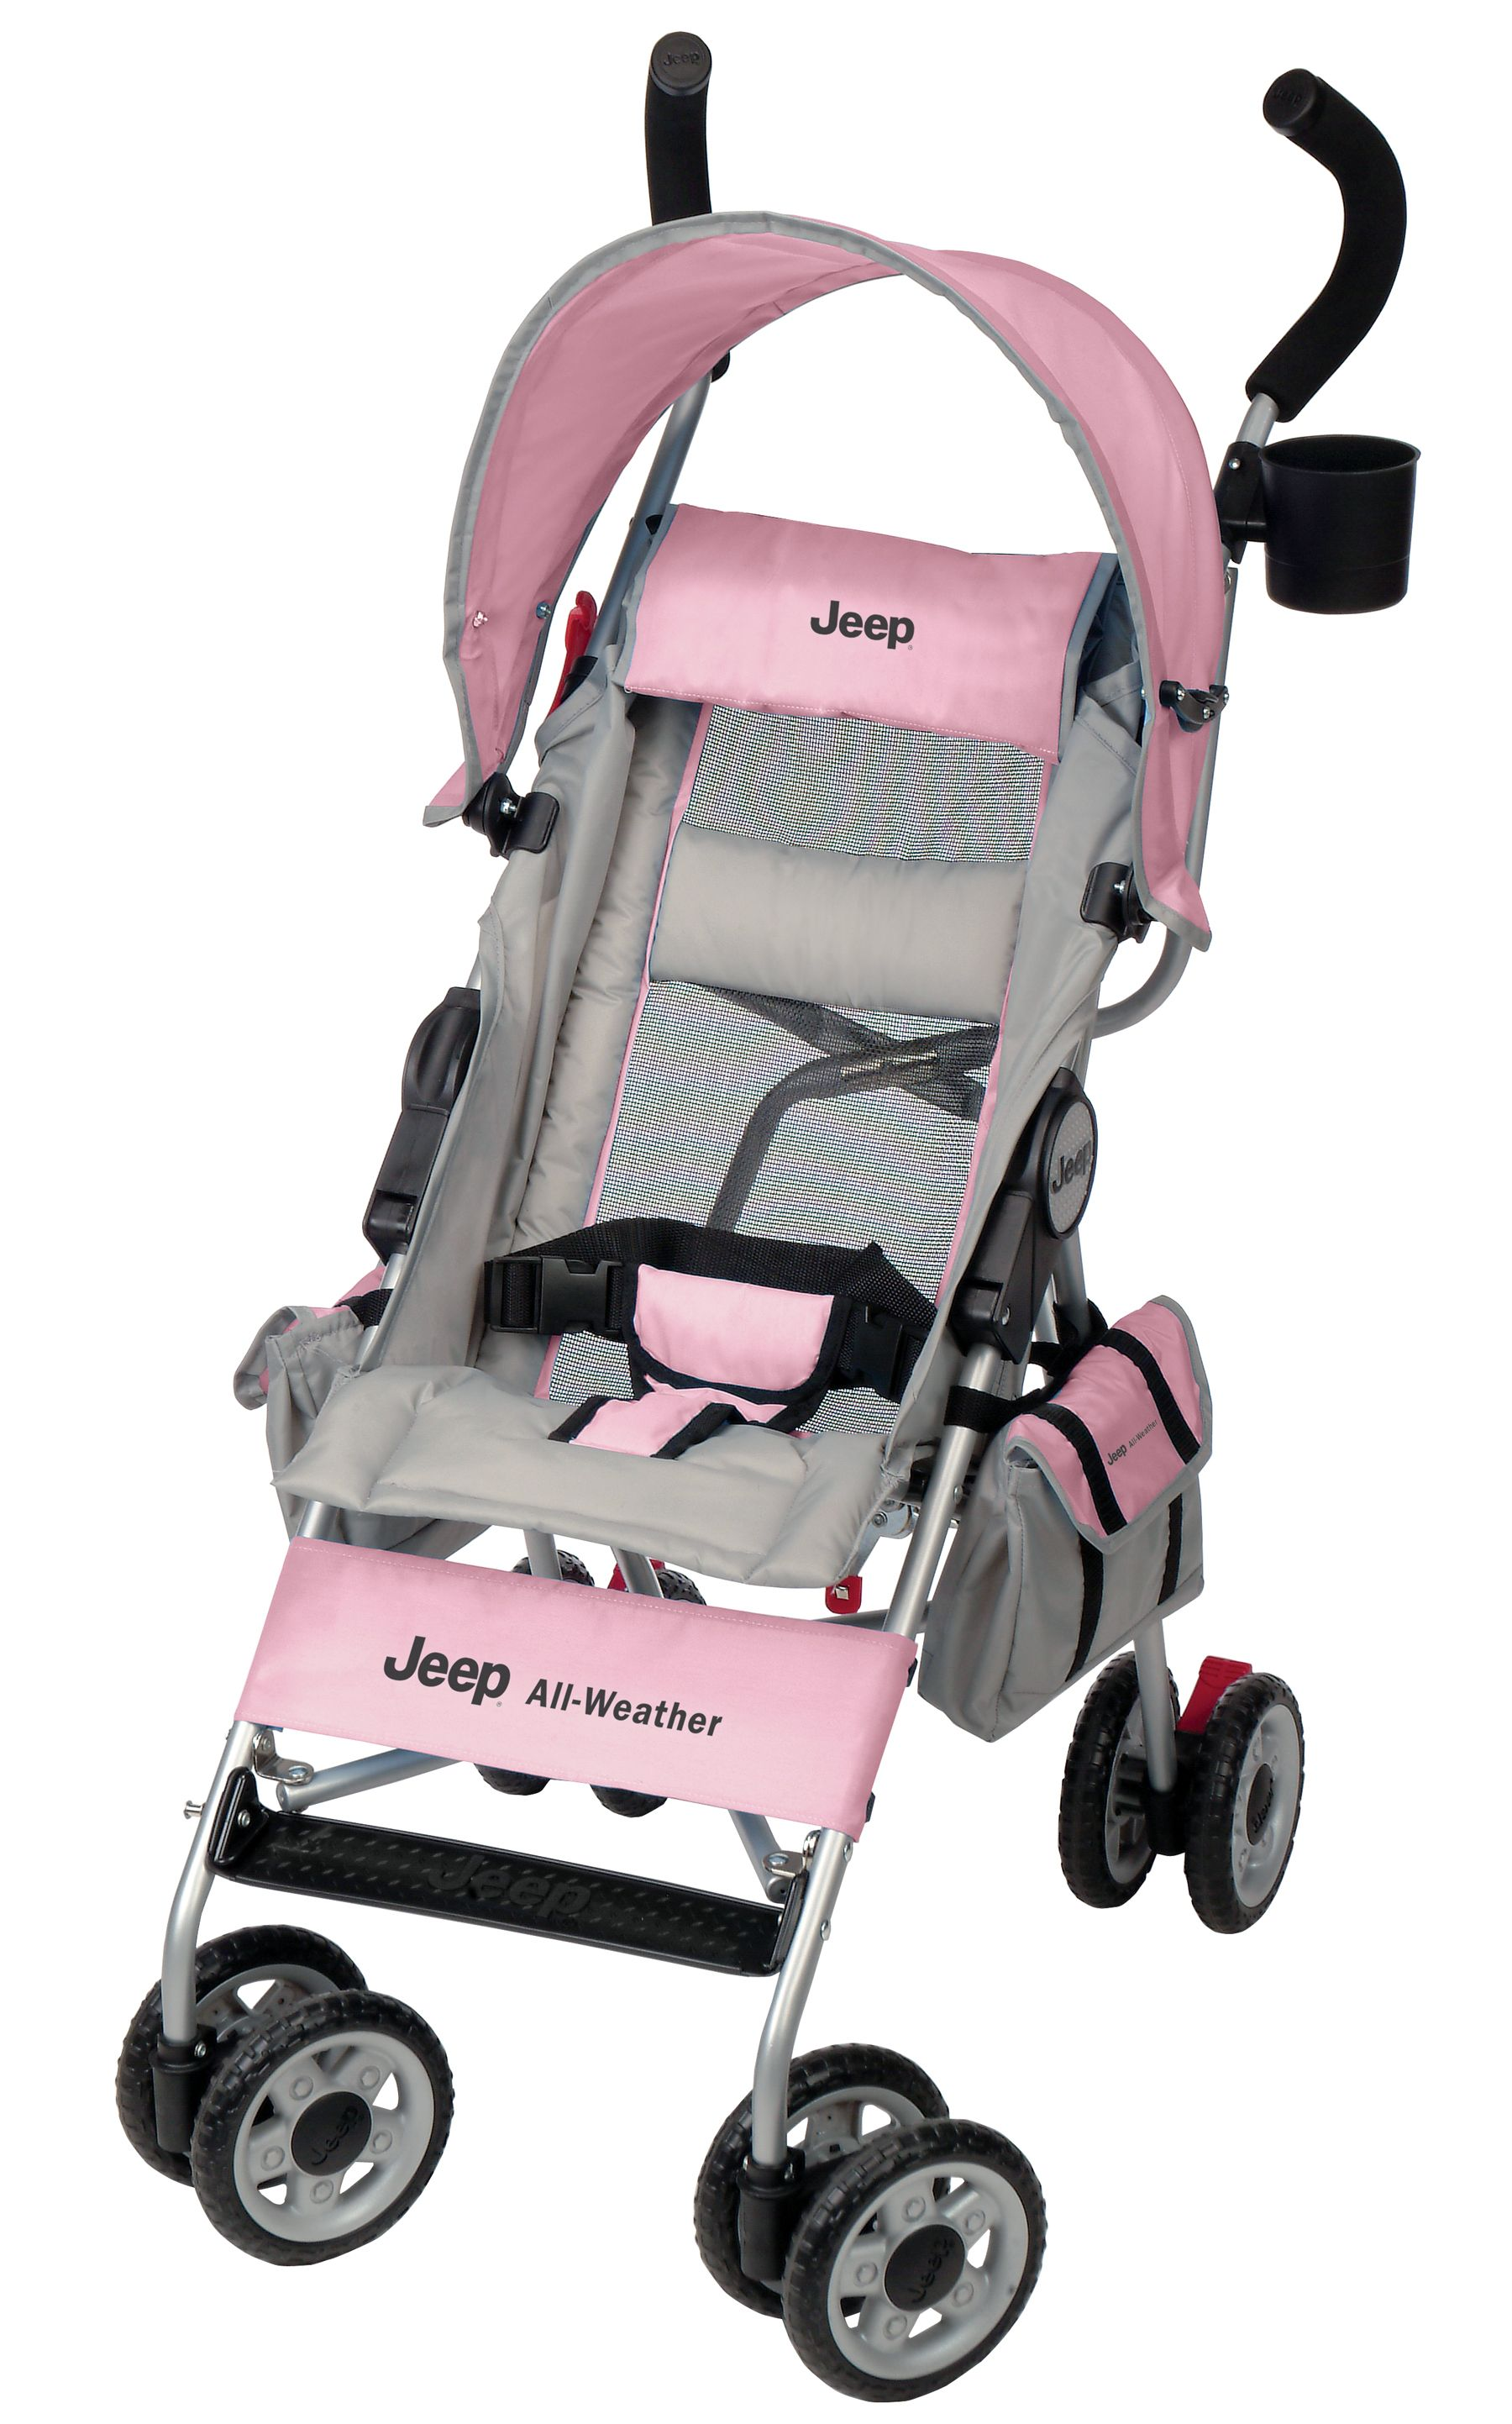 Jeep Wrangler AllWeather Umbrella Stroller Pink Features